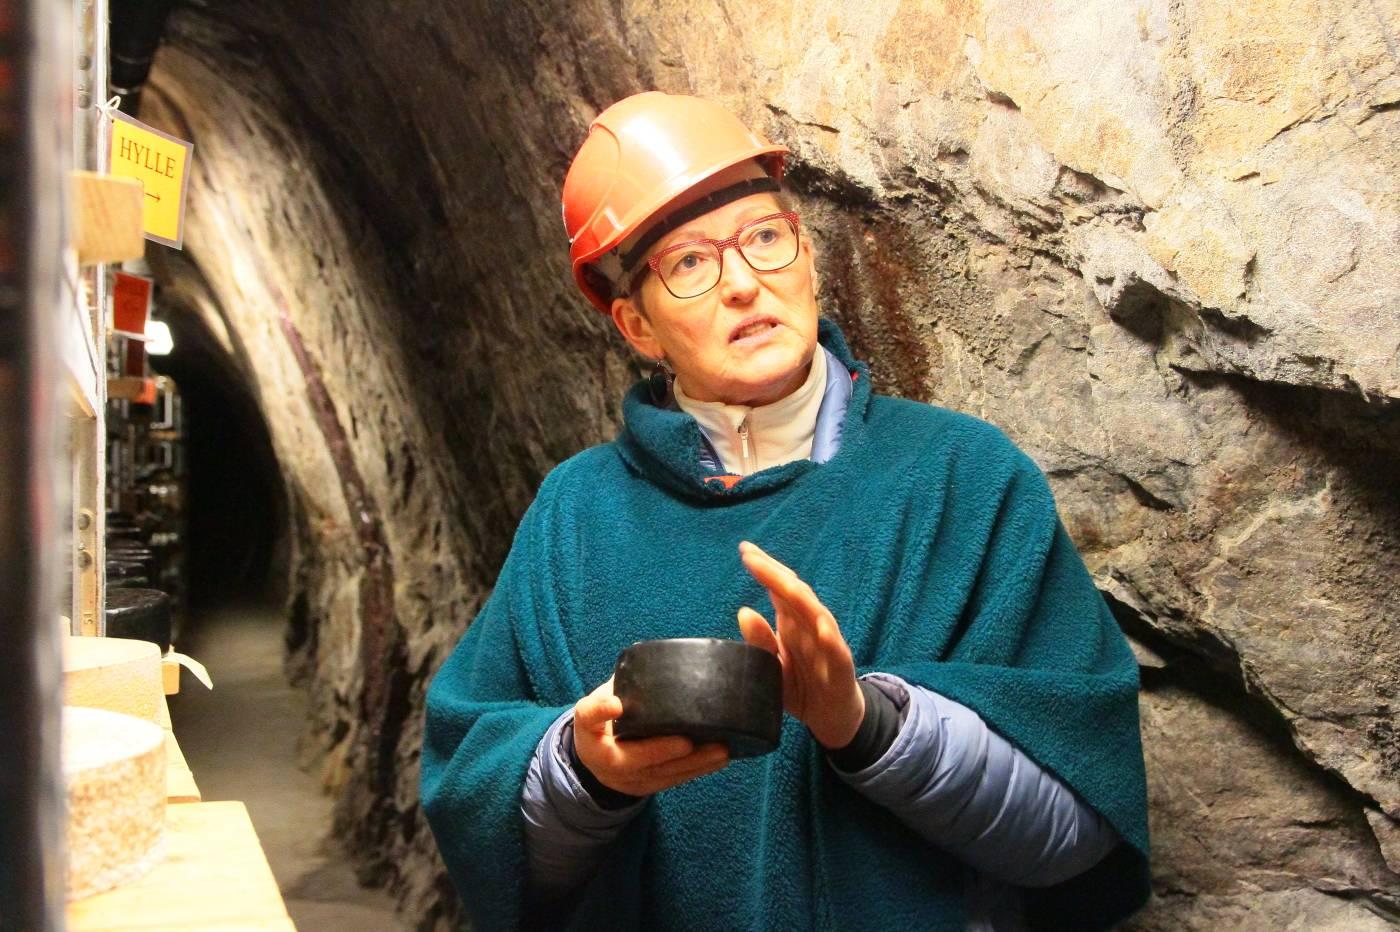 Osteskatten i gruvene